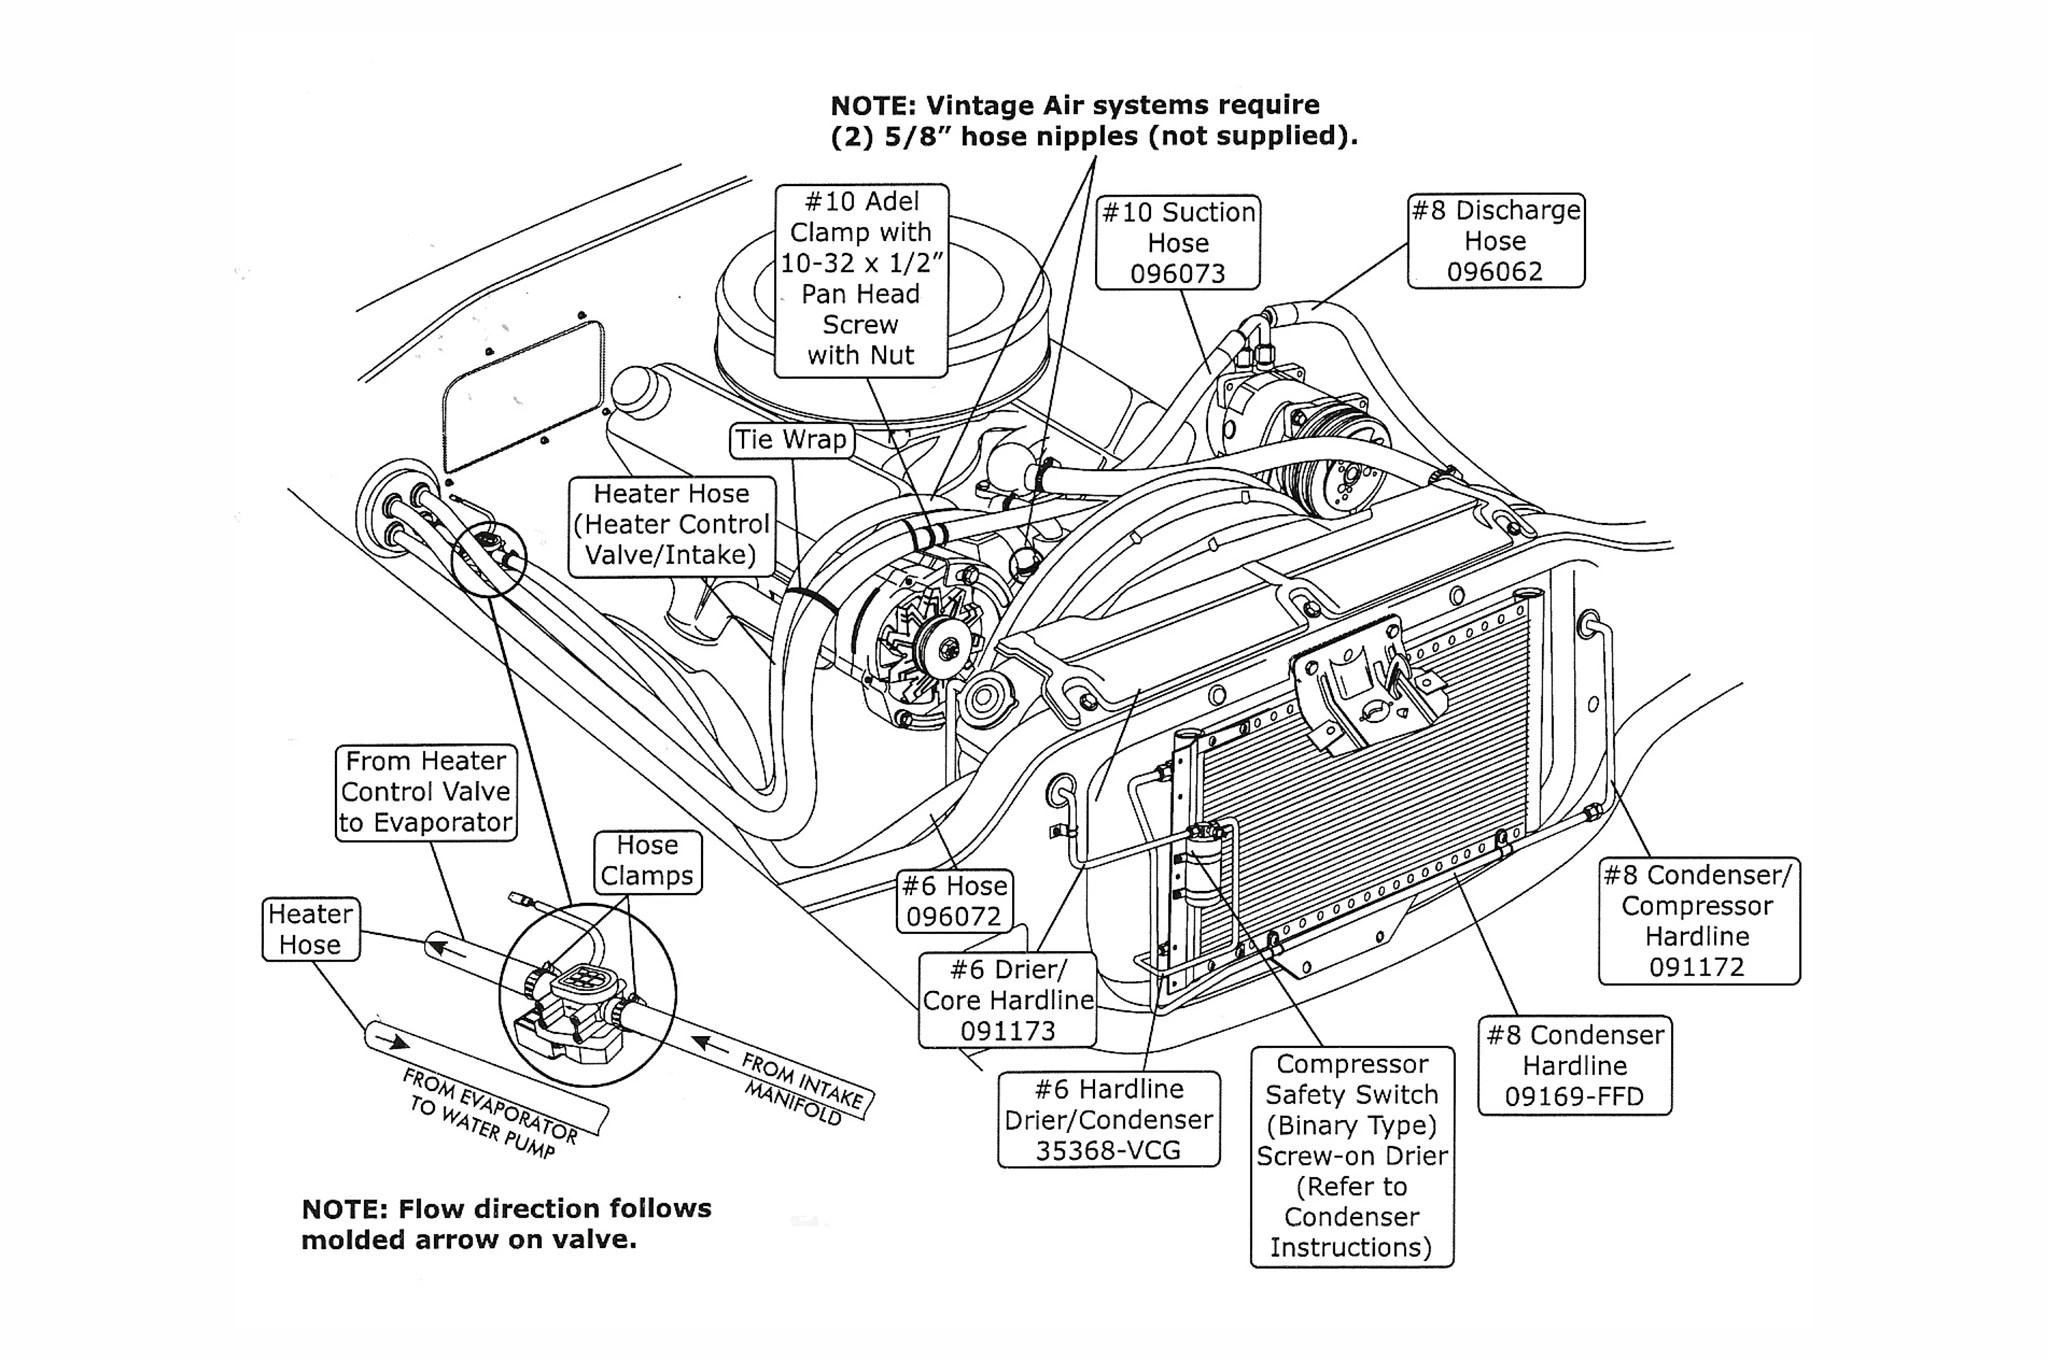 1971 chevelle fuel line diagram wiring diagram paper el camino fuel system diagram [ 2048 x 1360 Pixel ]